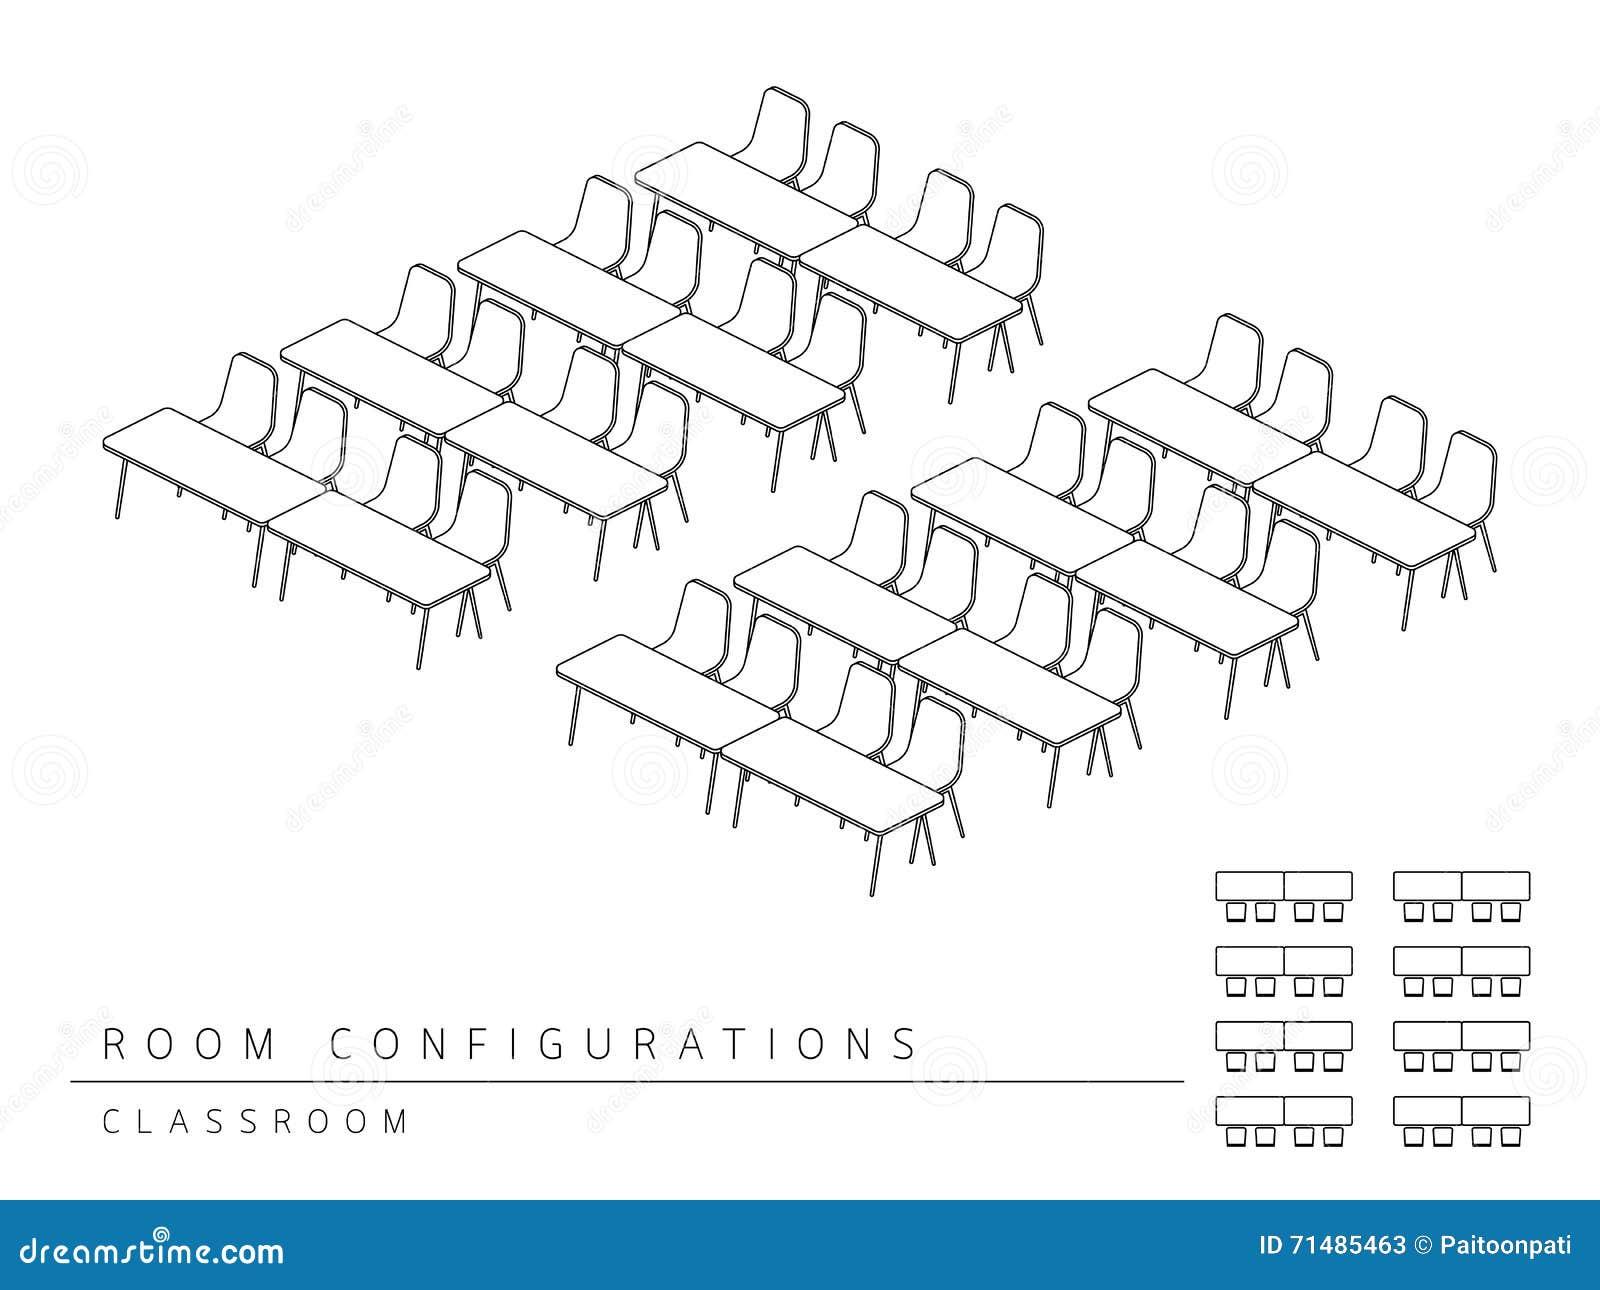 classroom set up diagram style